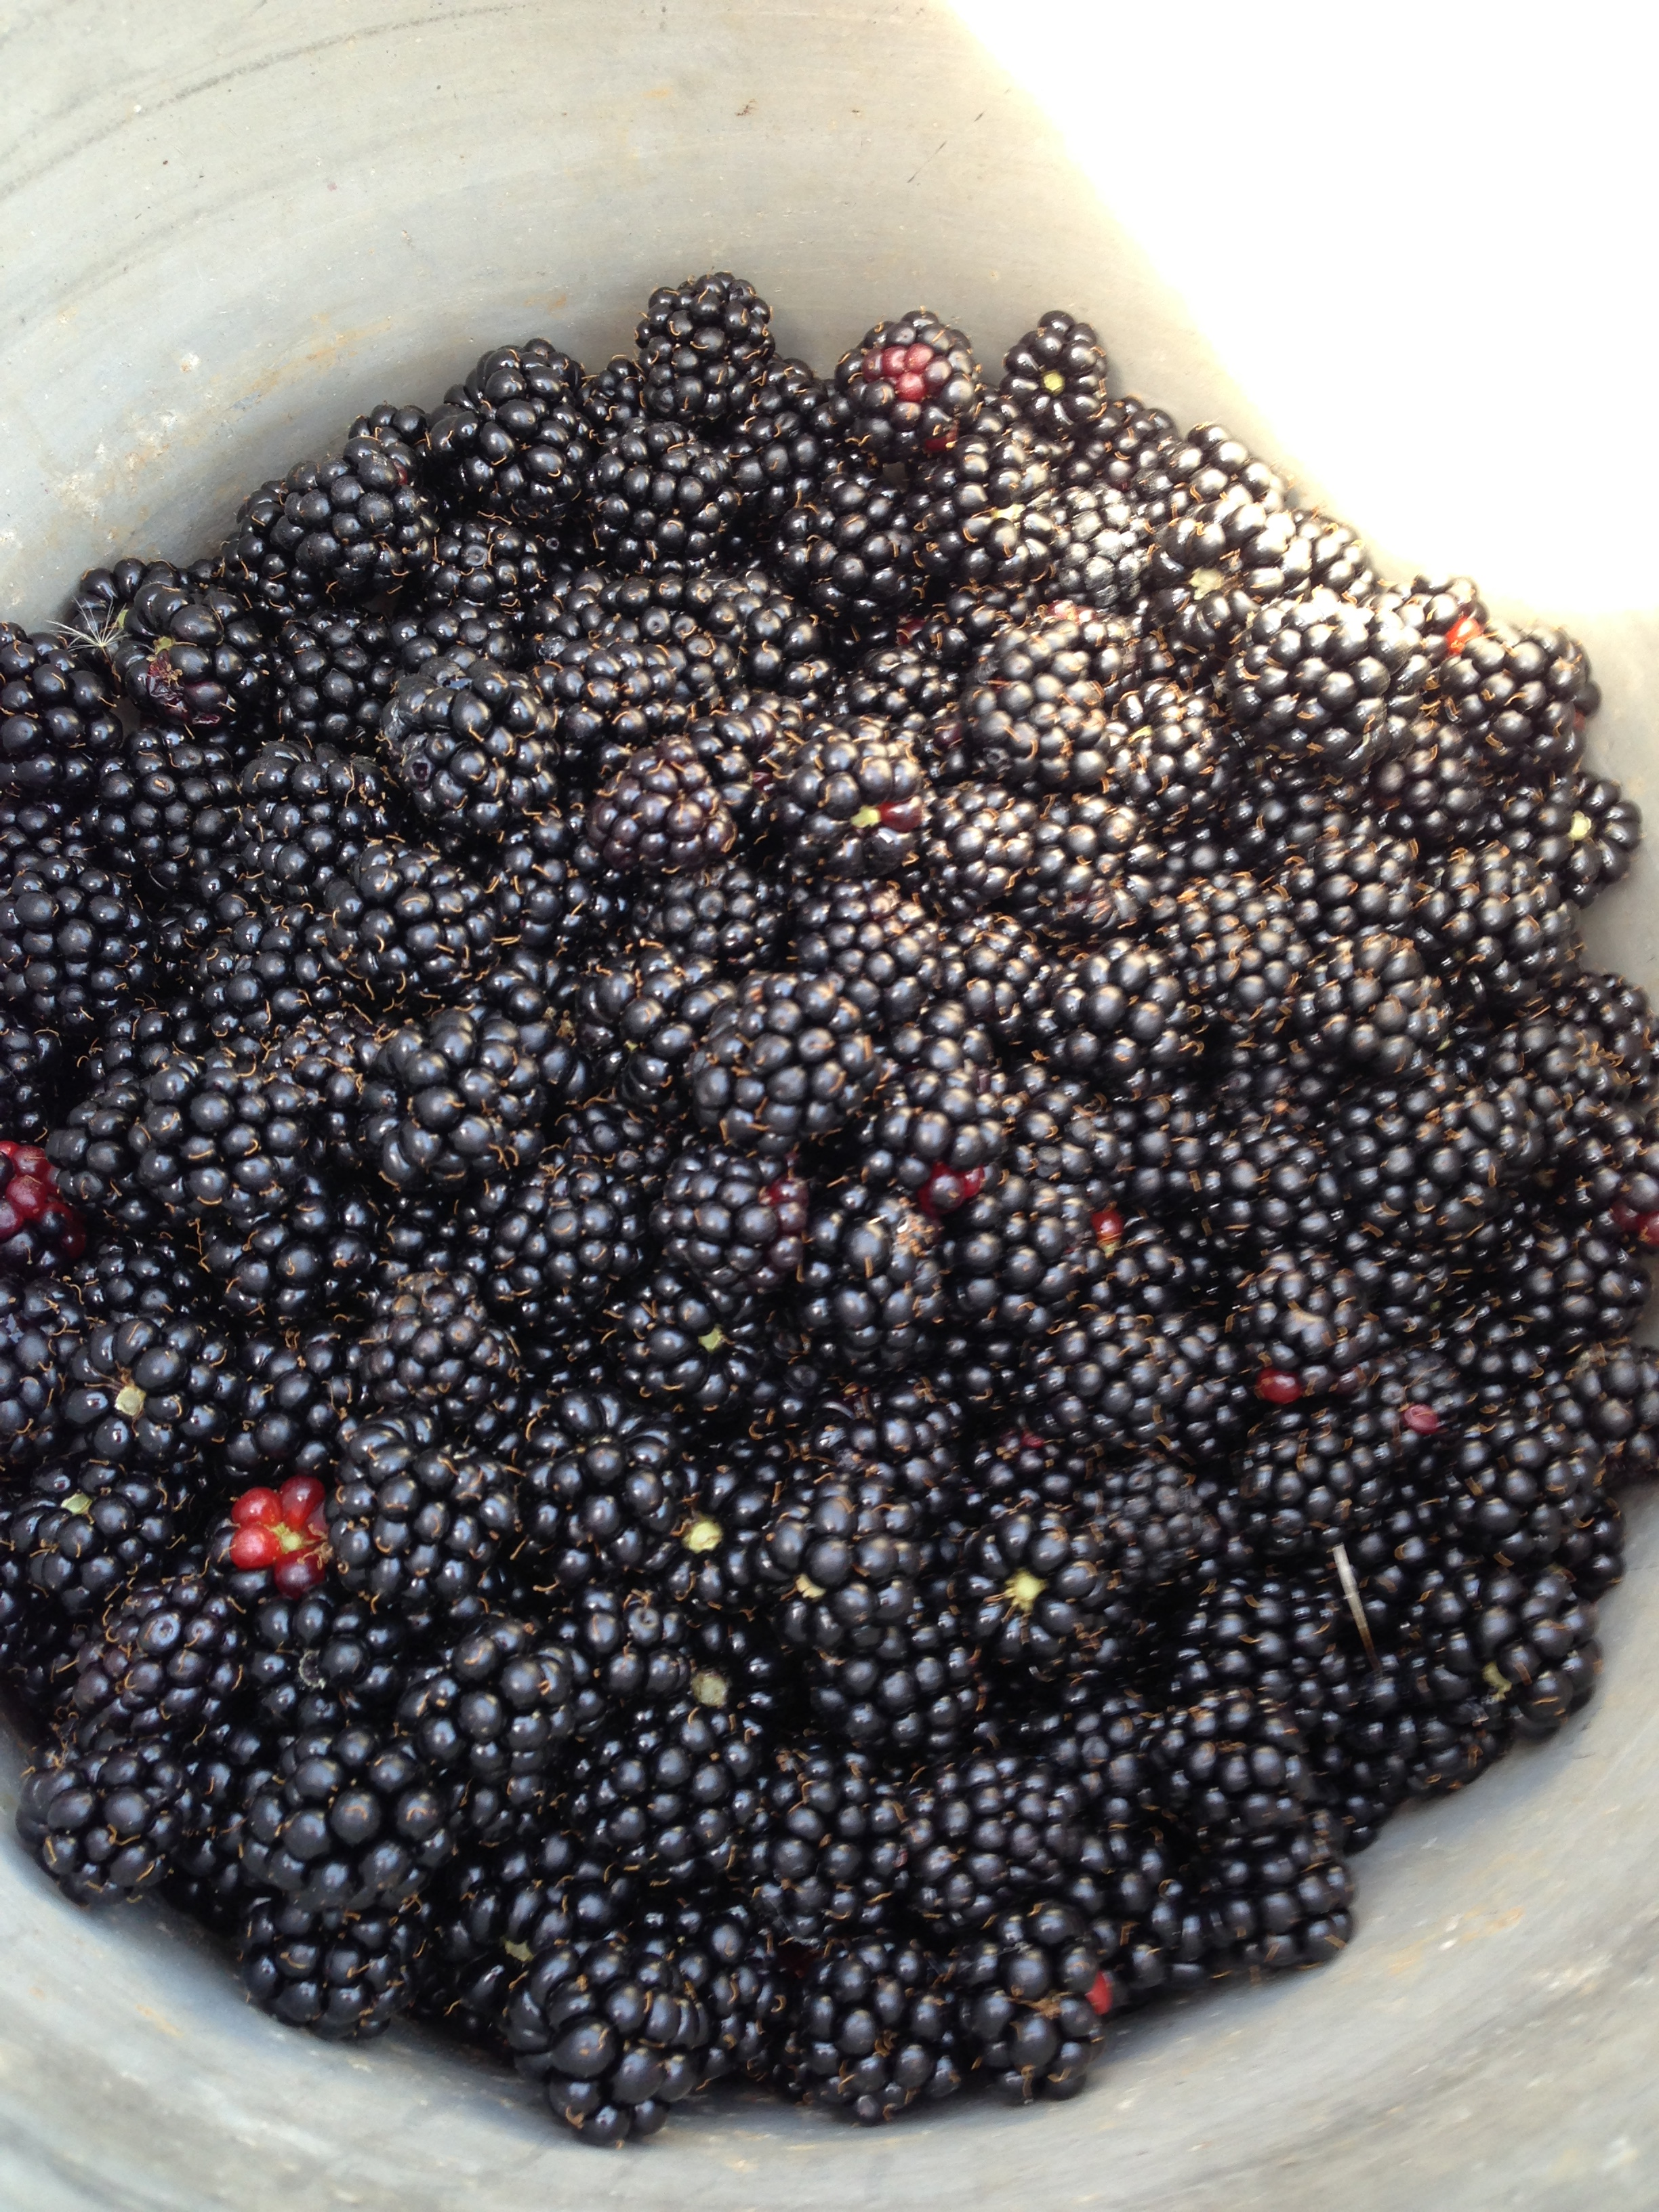 Fresh Blackberries in my Bucket!